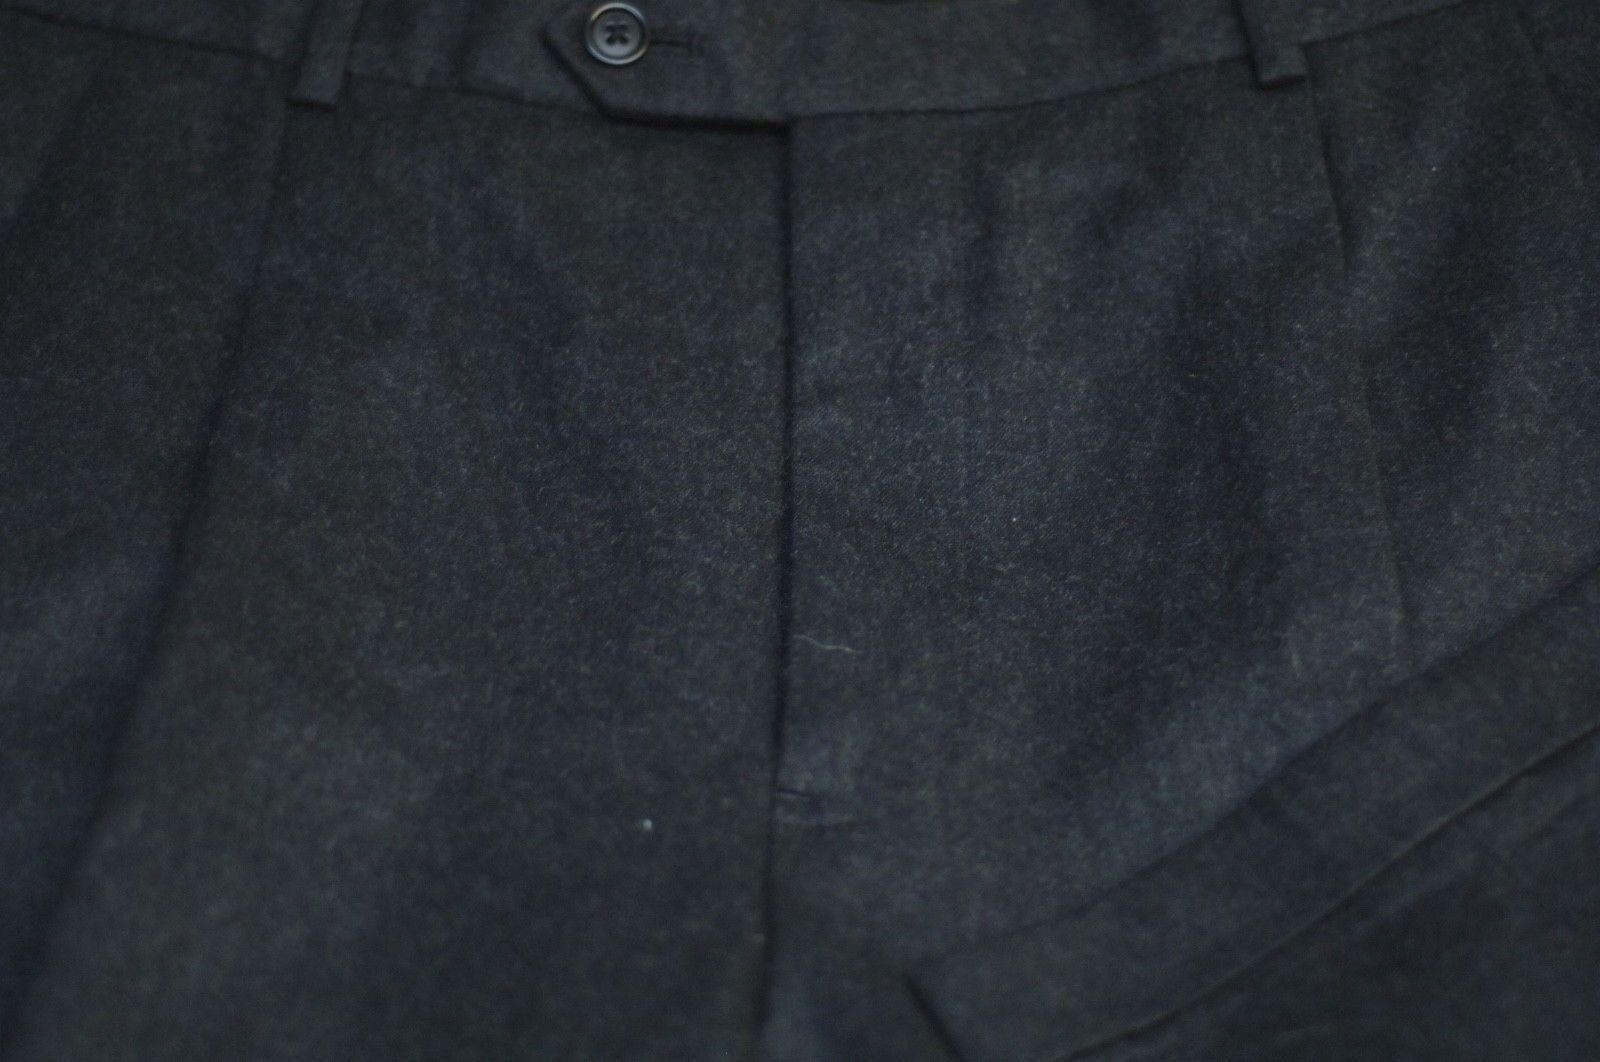 Brooks Bredhers Men's Charcoal Winter Weight Wool Pleated Dress Pants 32 x 30